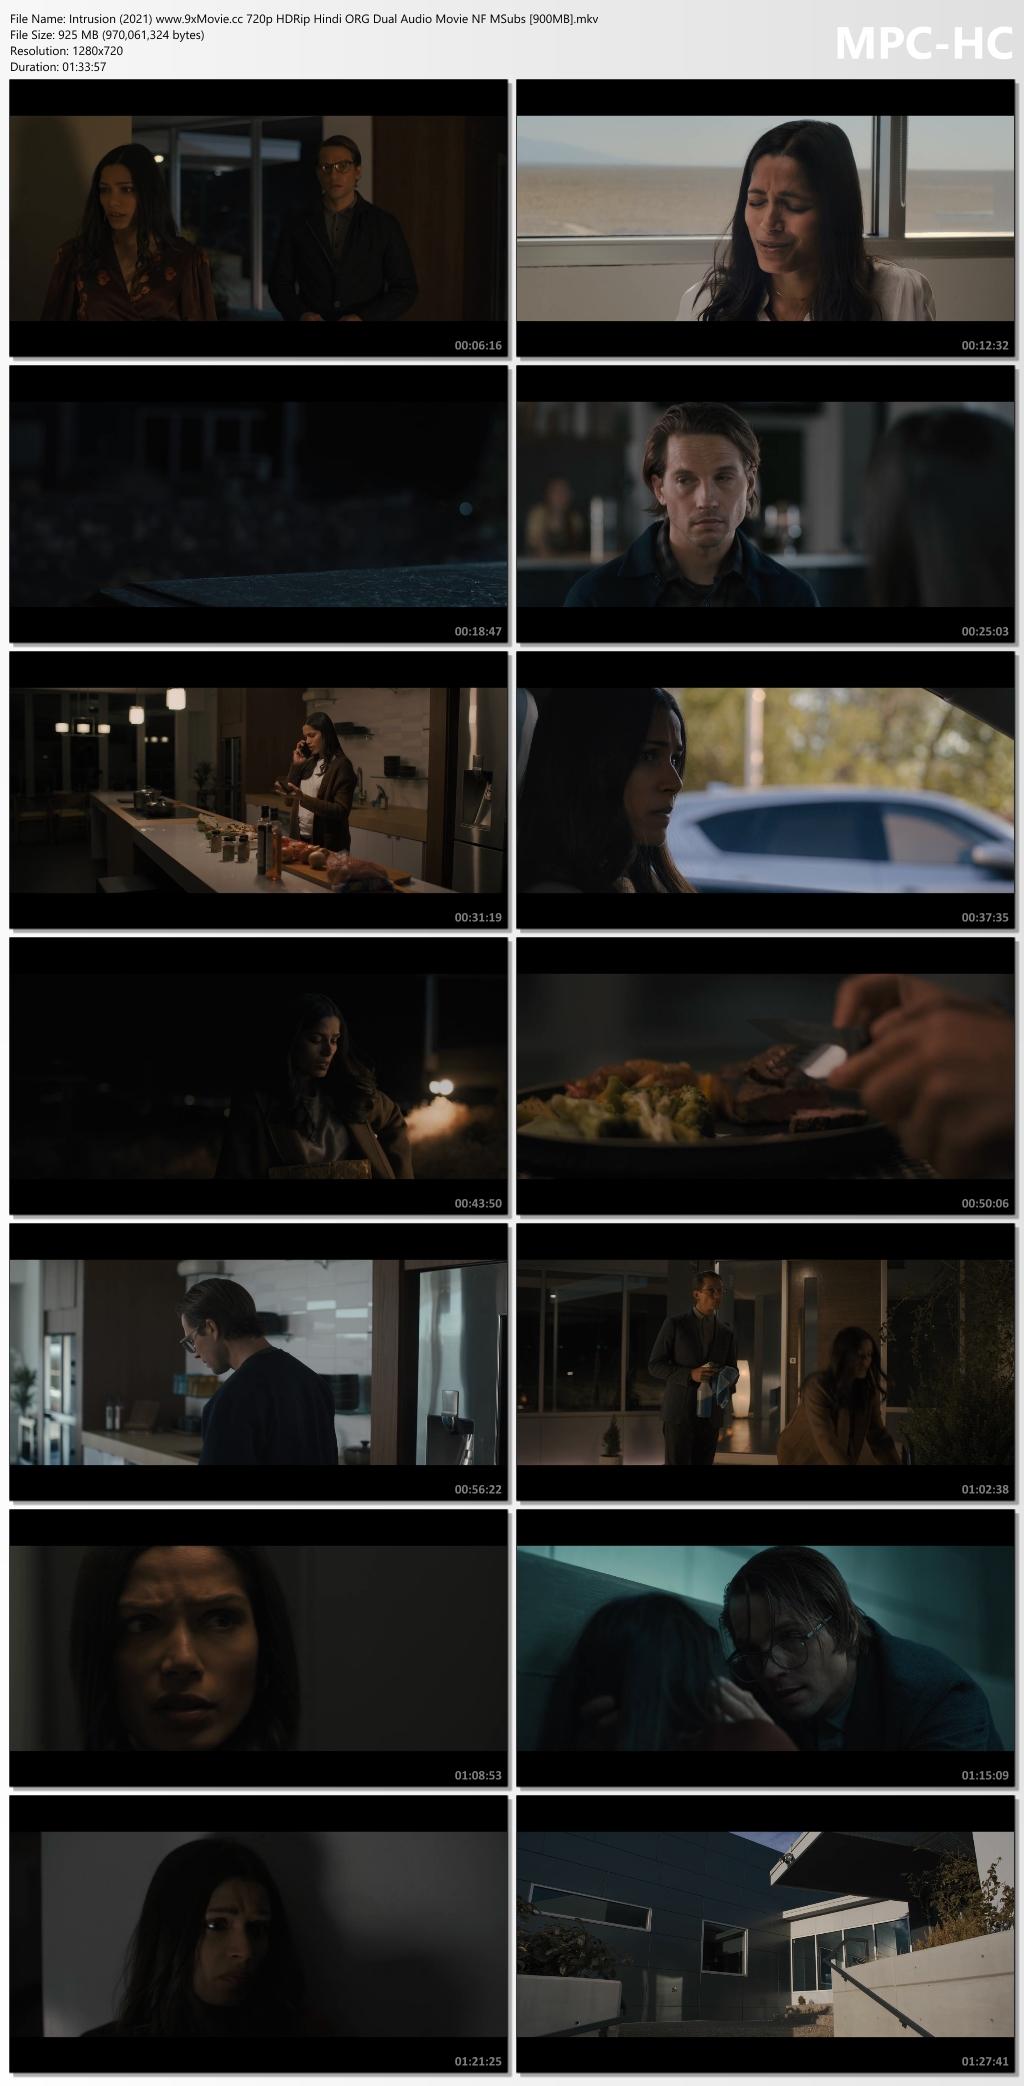 Intrusion-2021-www-9x-Movie-cc-720p-HDRip-Hindi-ORG-Dual-Audio-Movie-NF-MSubs-900-MB-mkv